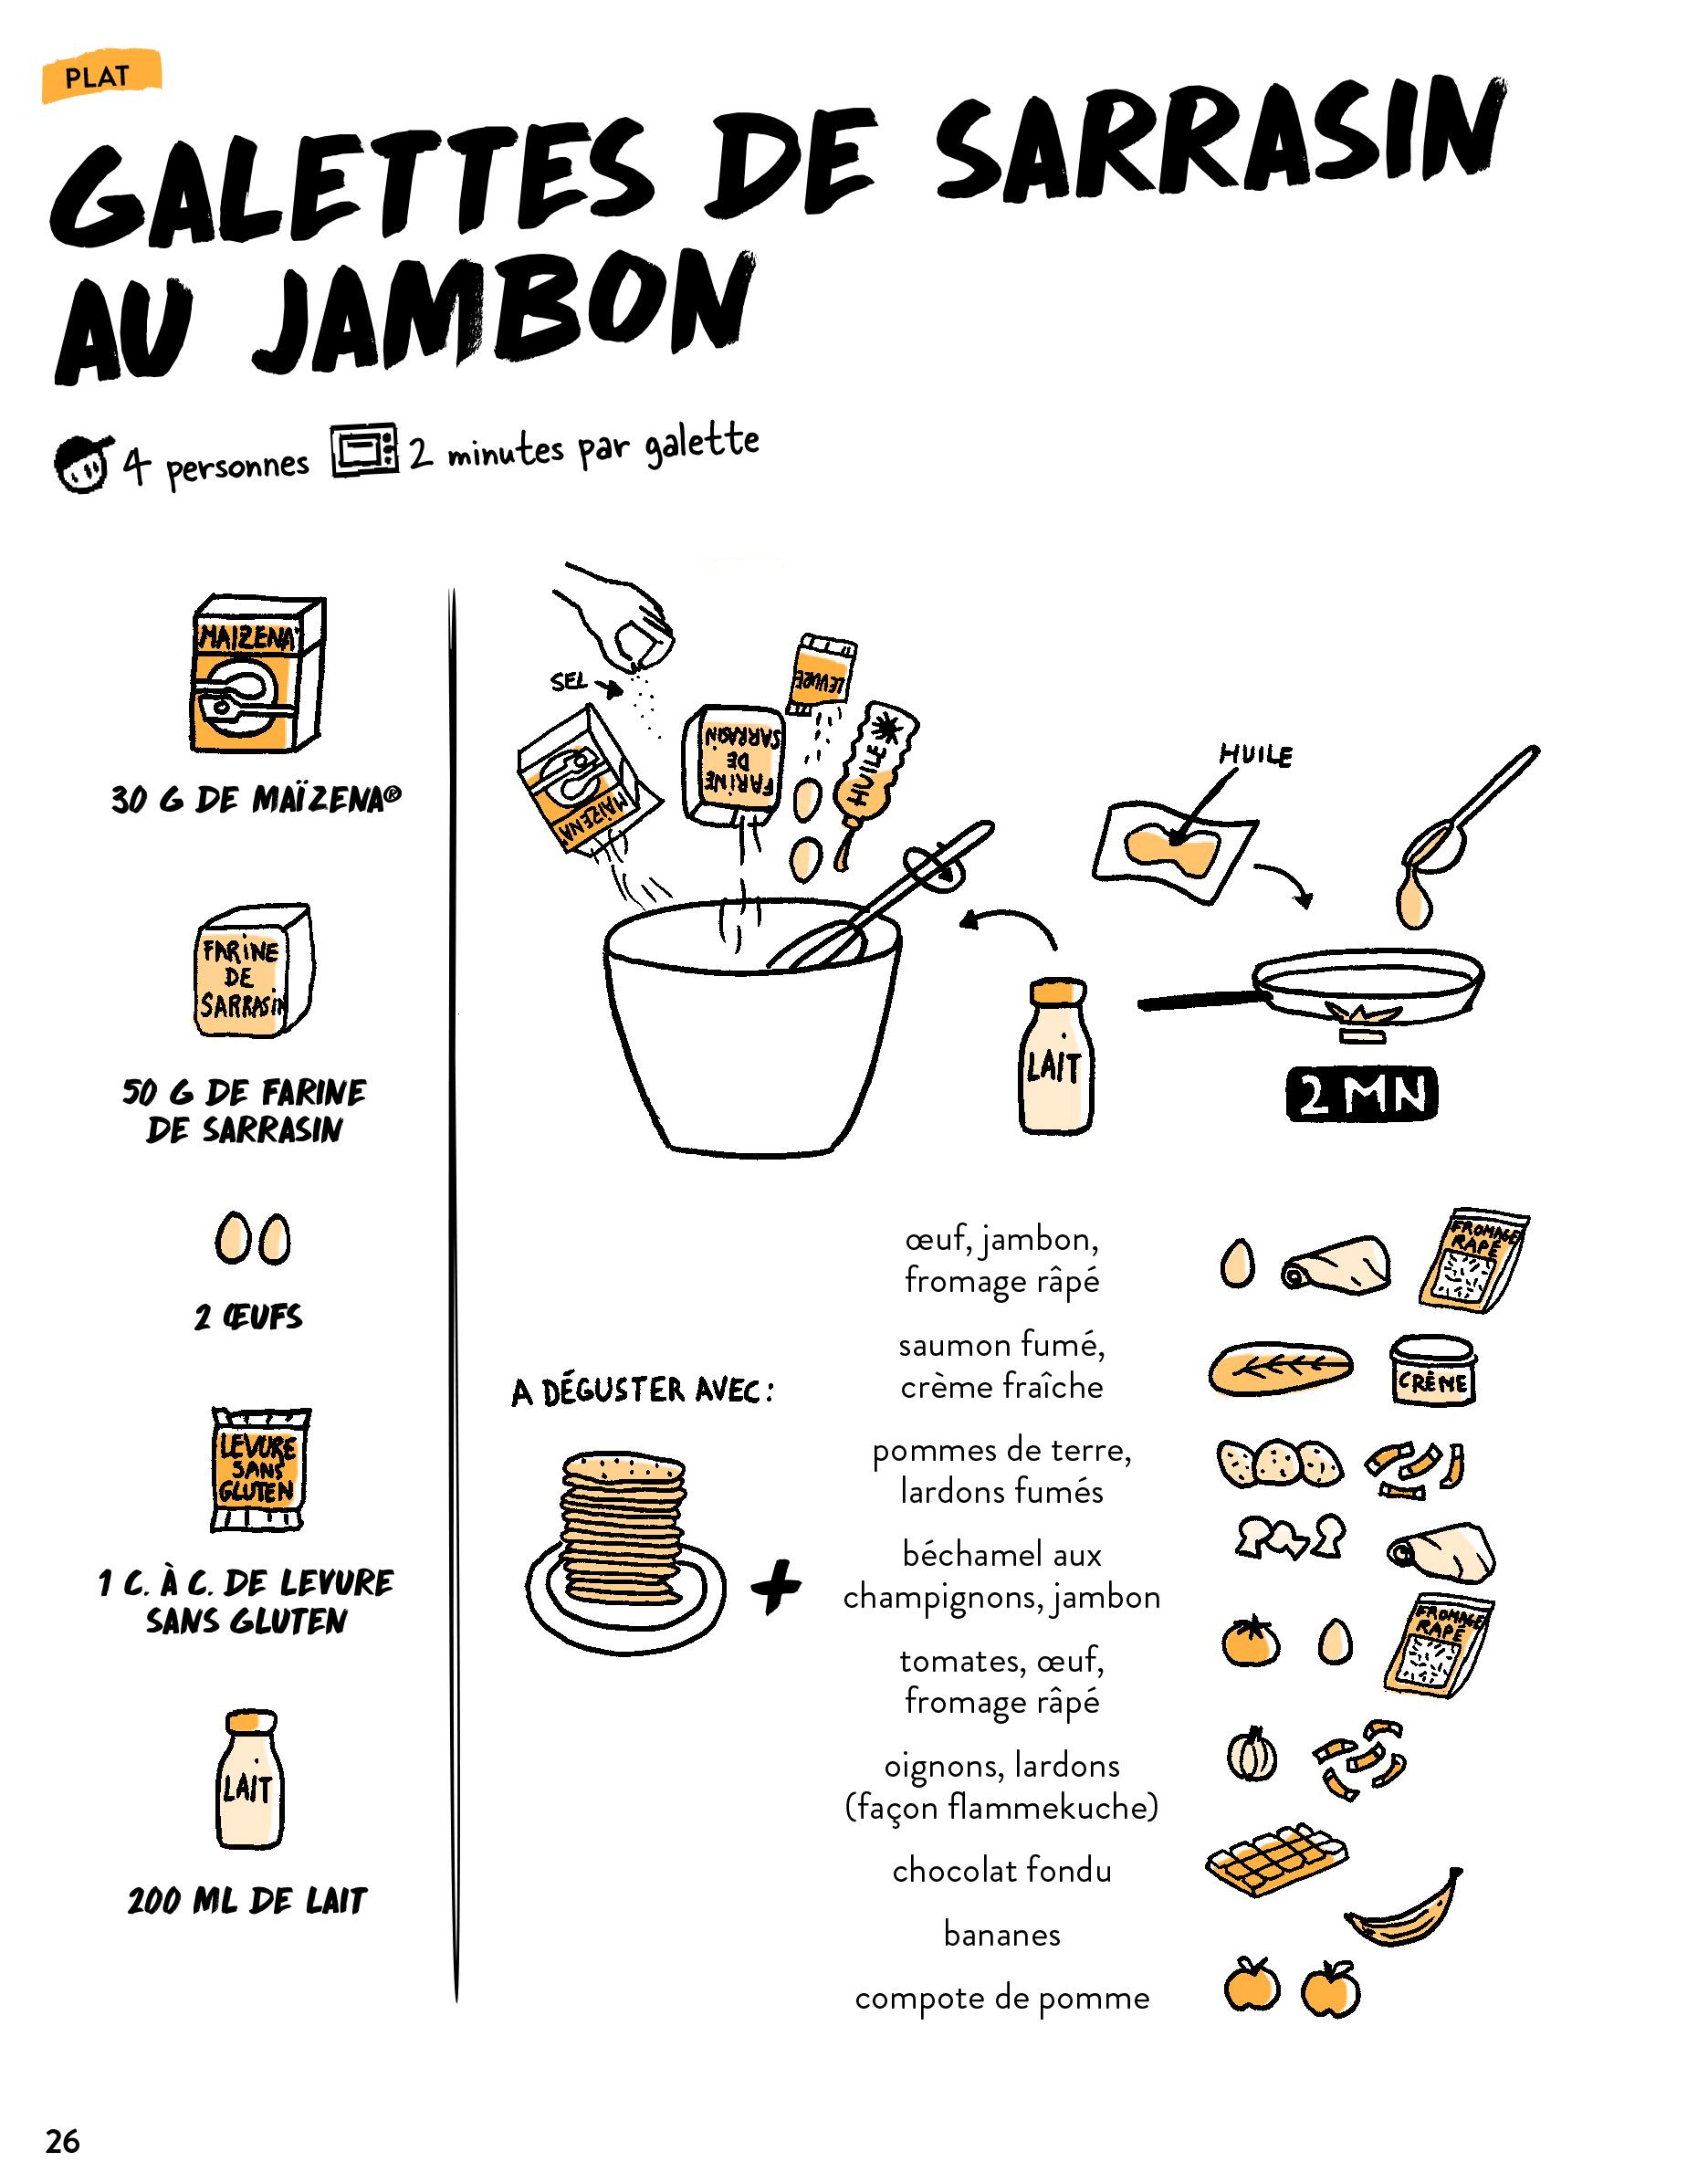 Galettes de sarrasin au jambon sans gluten